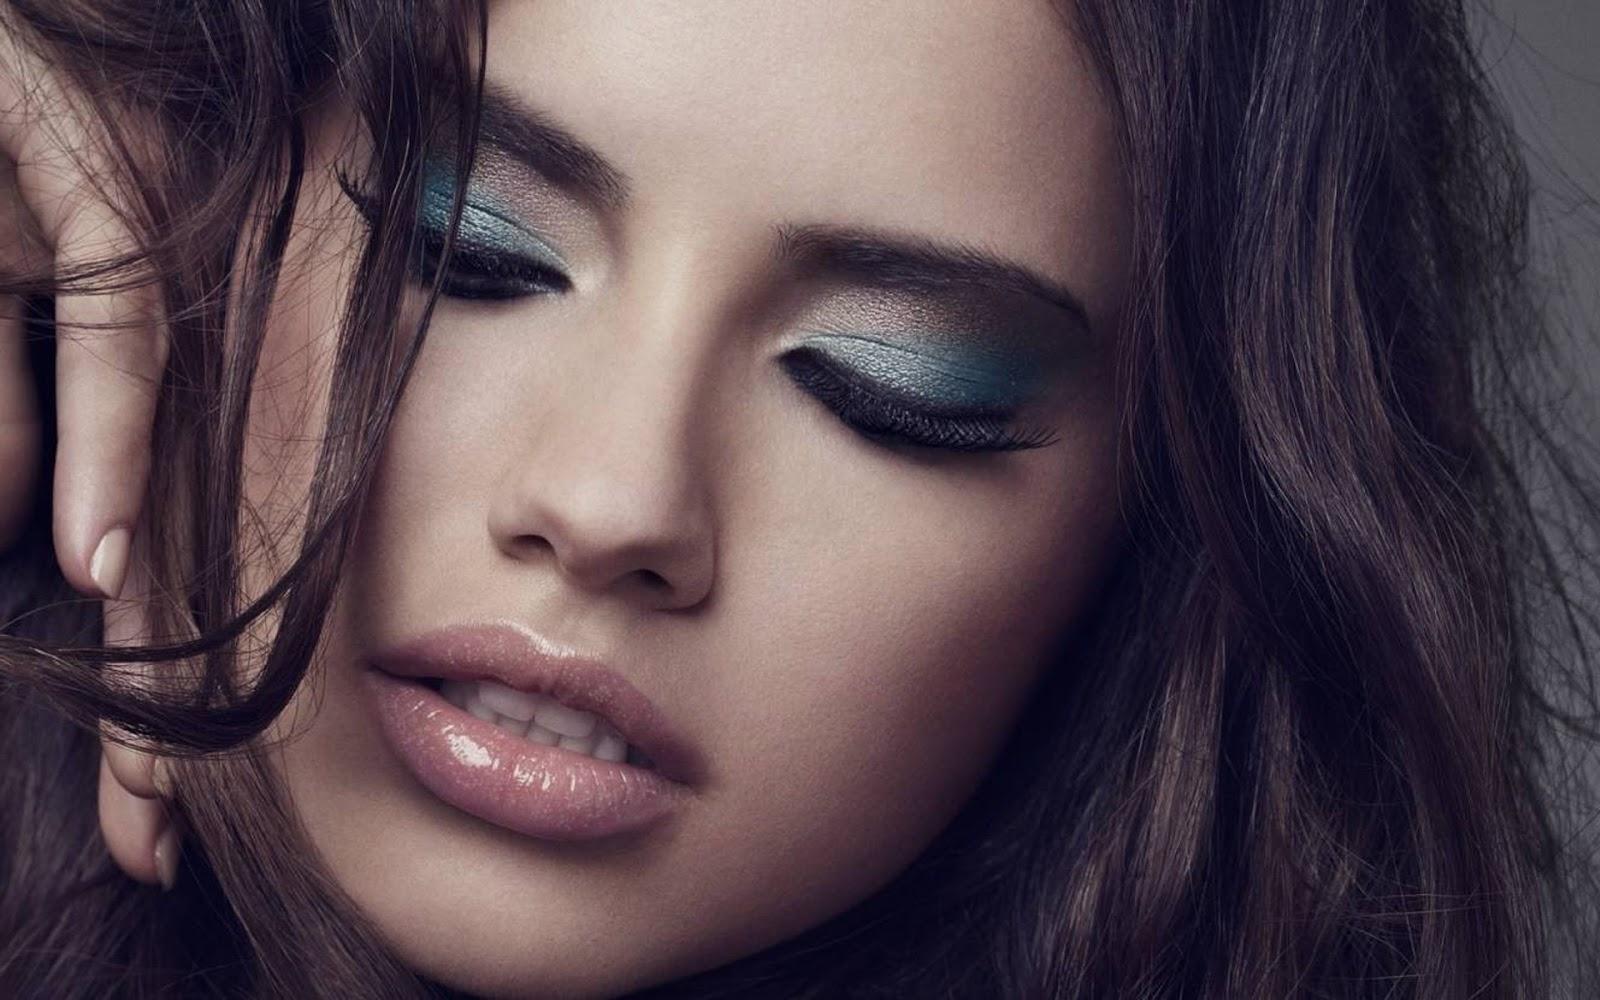 http://1.bp.blogspot.com/-4M0QfZi6goQ/UNxYqNZ9n2I/AAAAAAAAL4E/sqHjwyBH6dk/s1600/Adriana-Lima-Eyes-Closed-1200.jpg